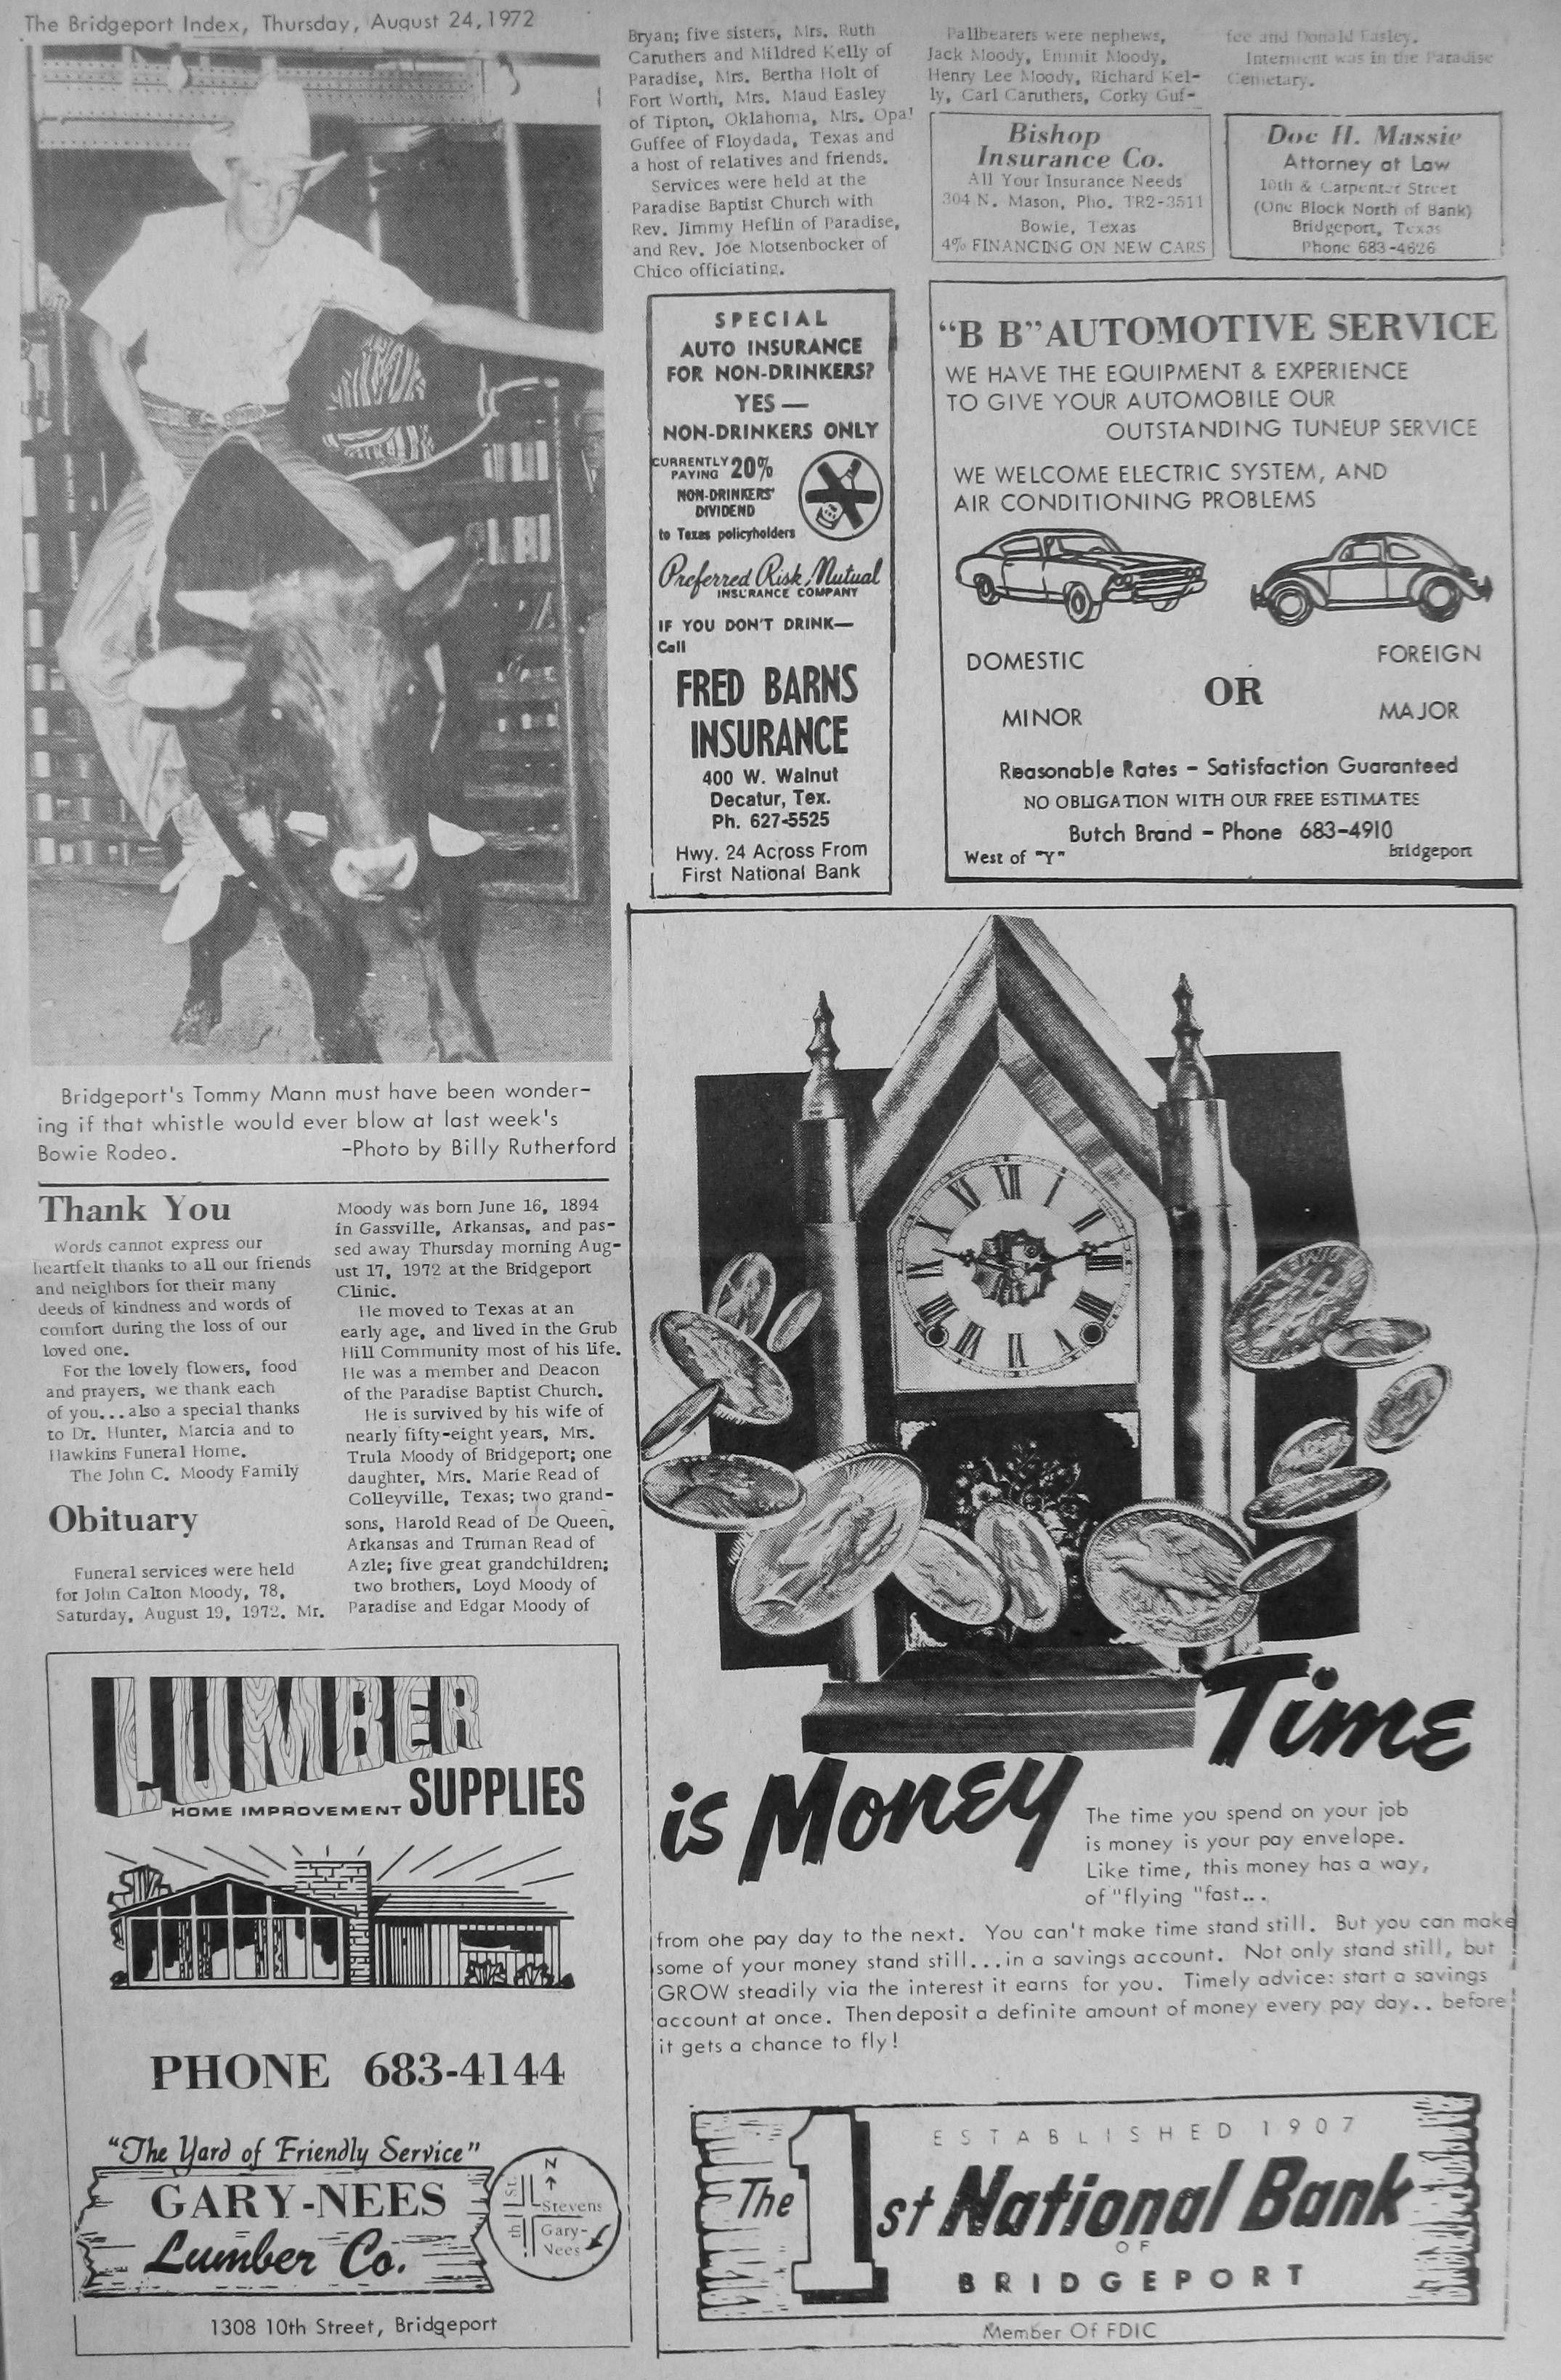 Http Www Wisecountytexas Info Bridgeportindex Images 1972 1972